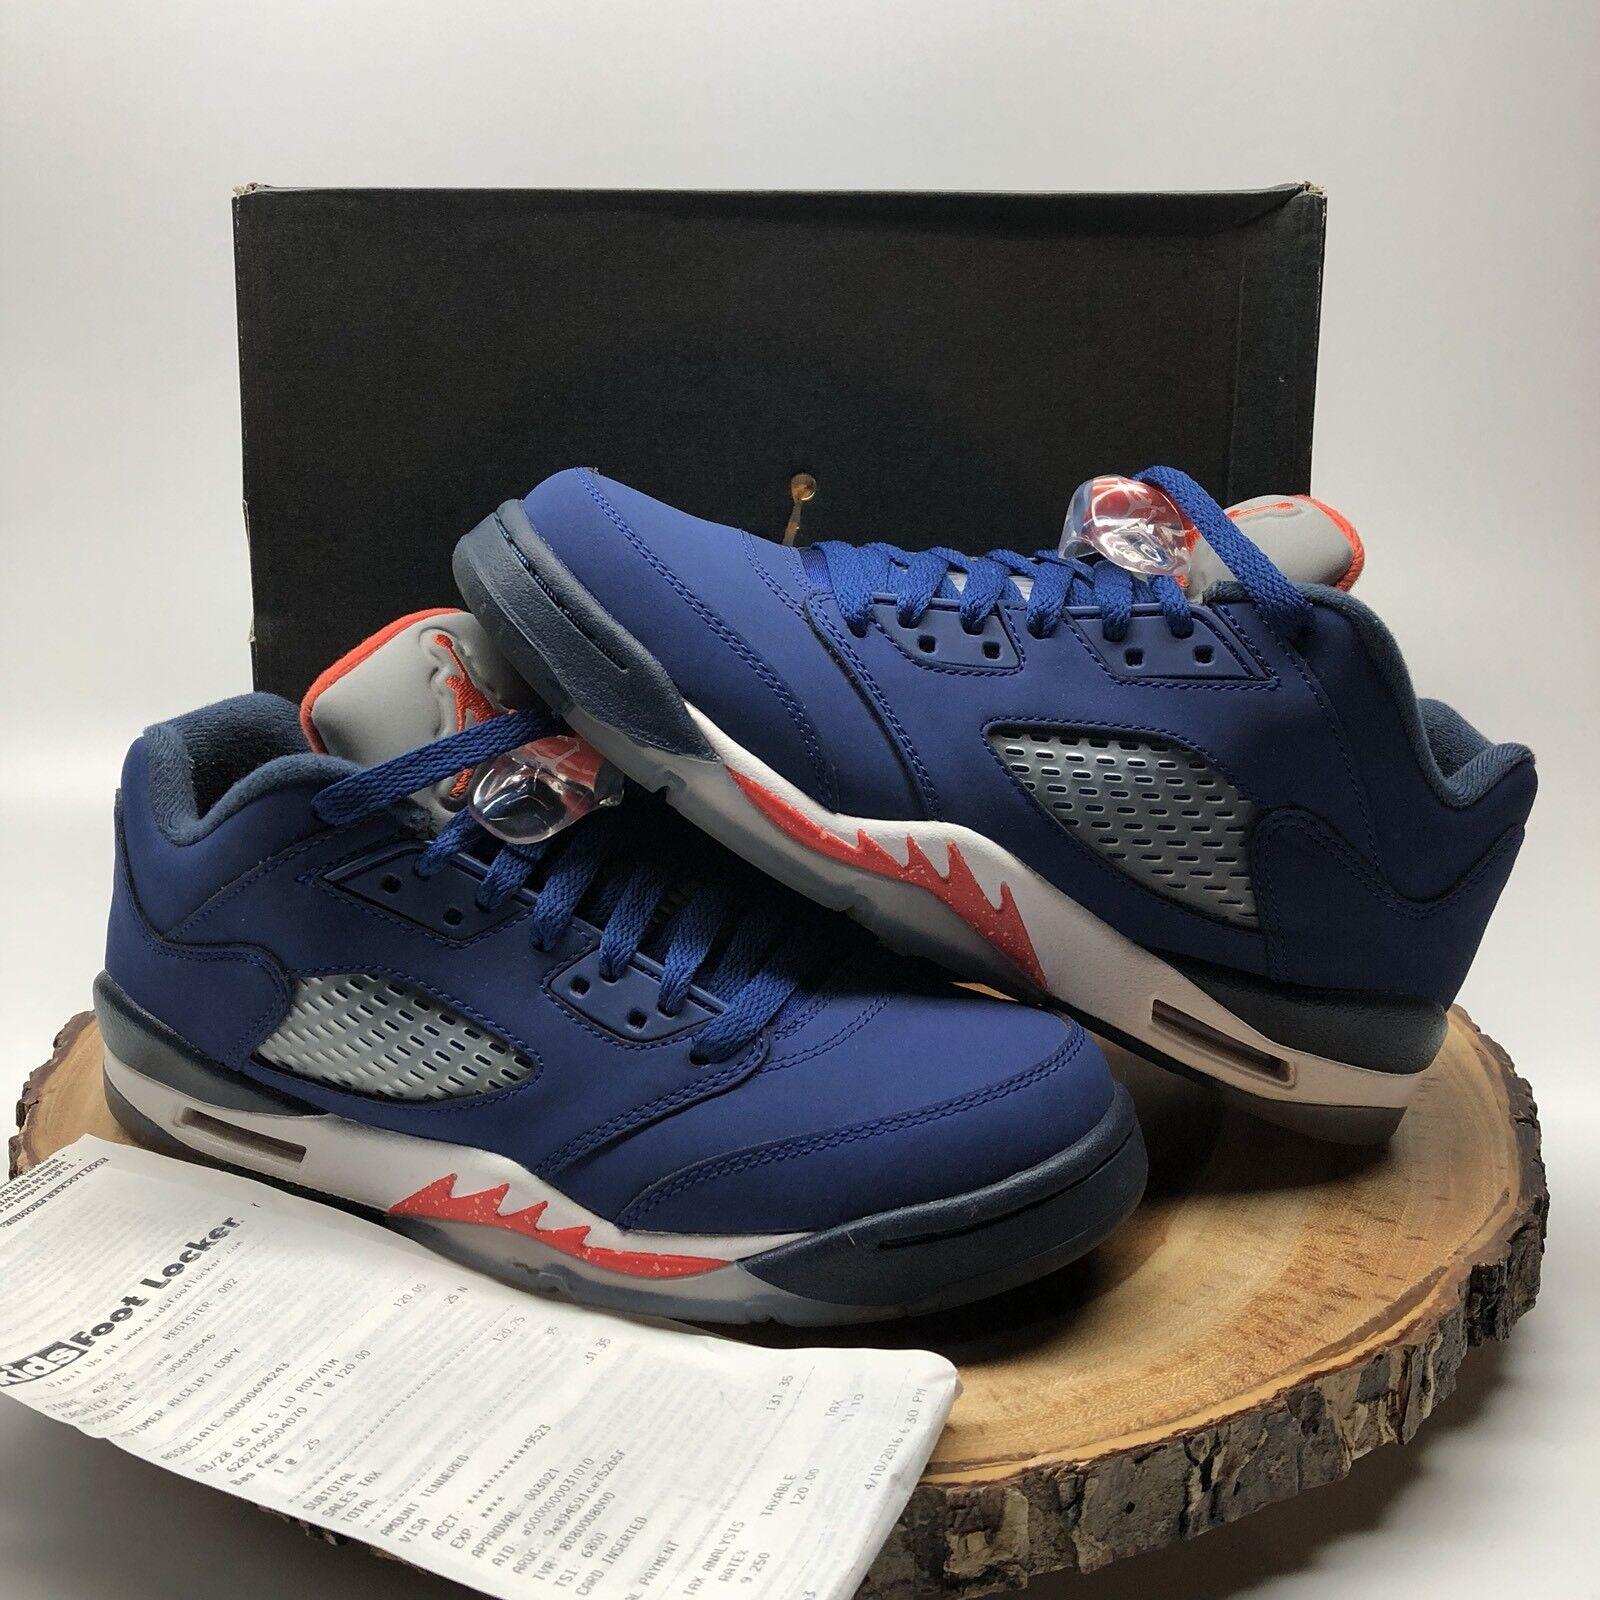 Nike Air Jordan Retro V Low blueee Knicks orange Size 7y 314338 417 Fire Red XI IV